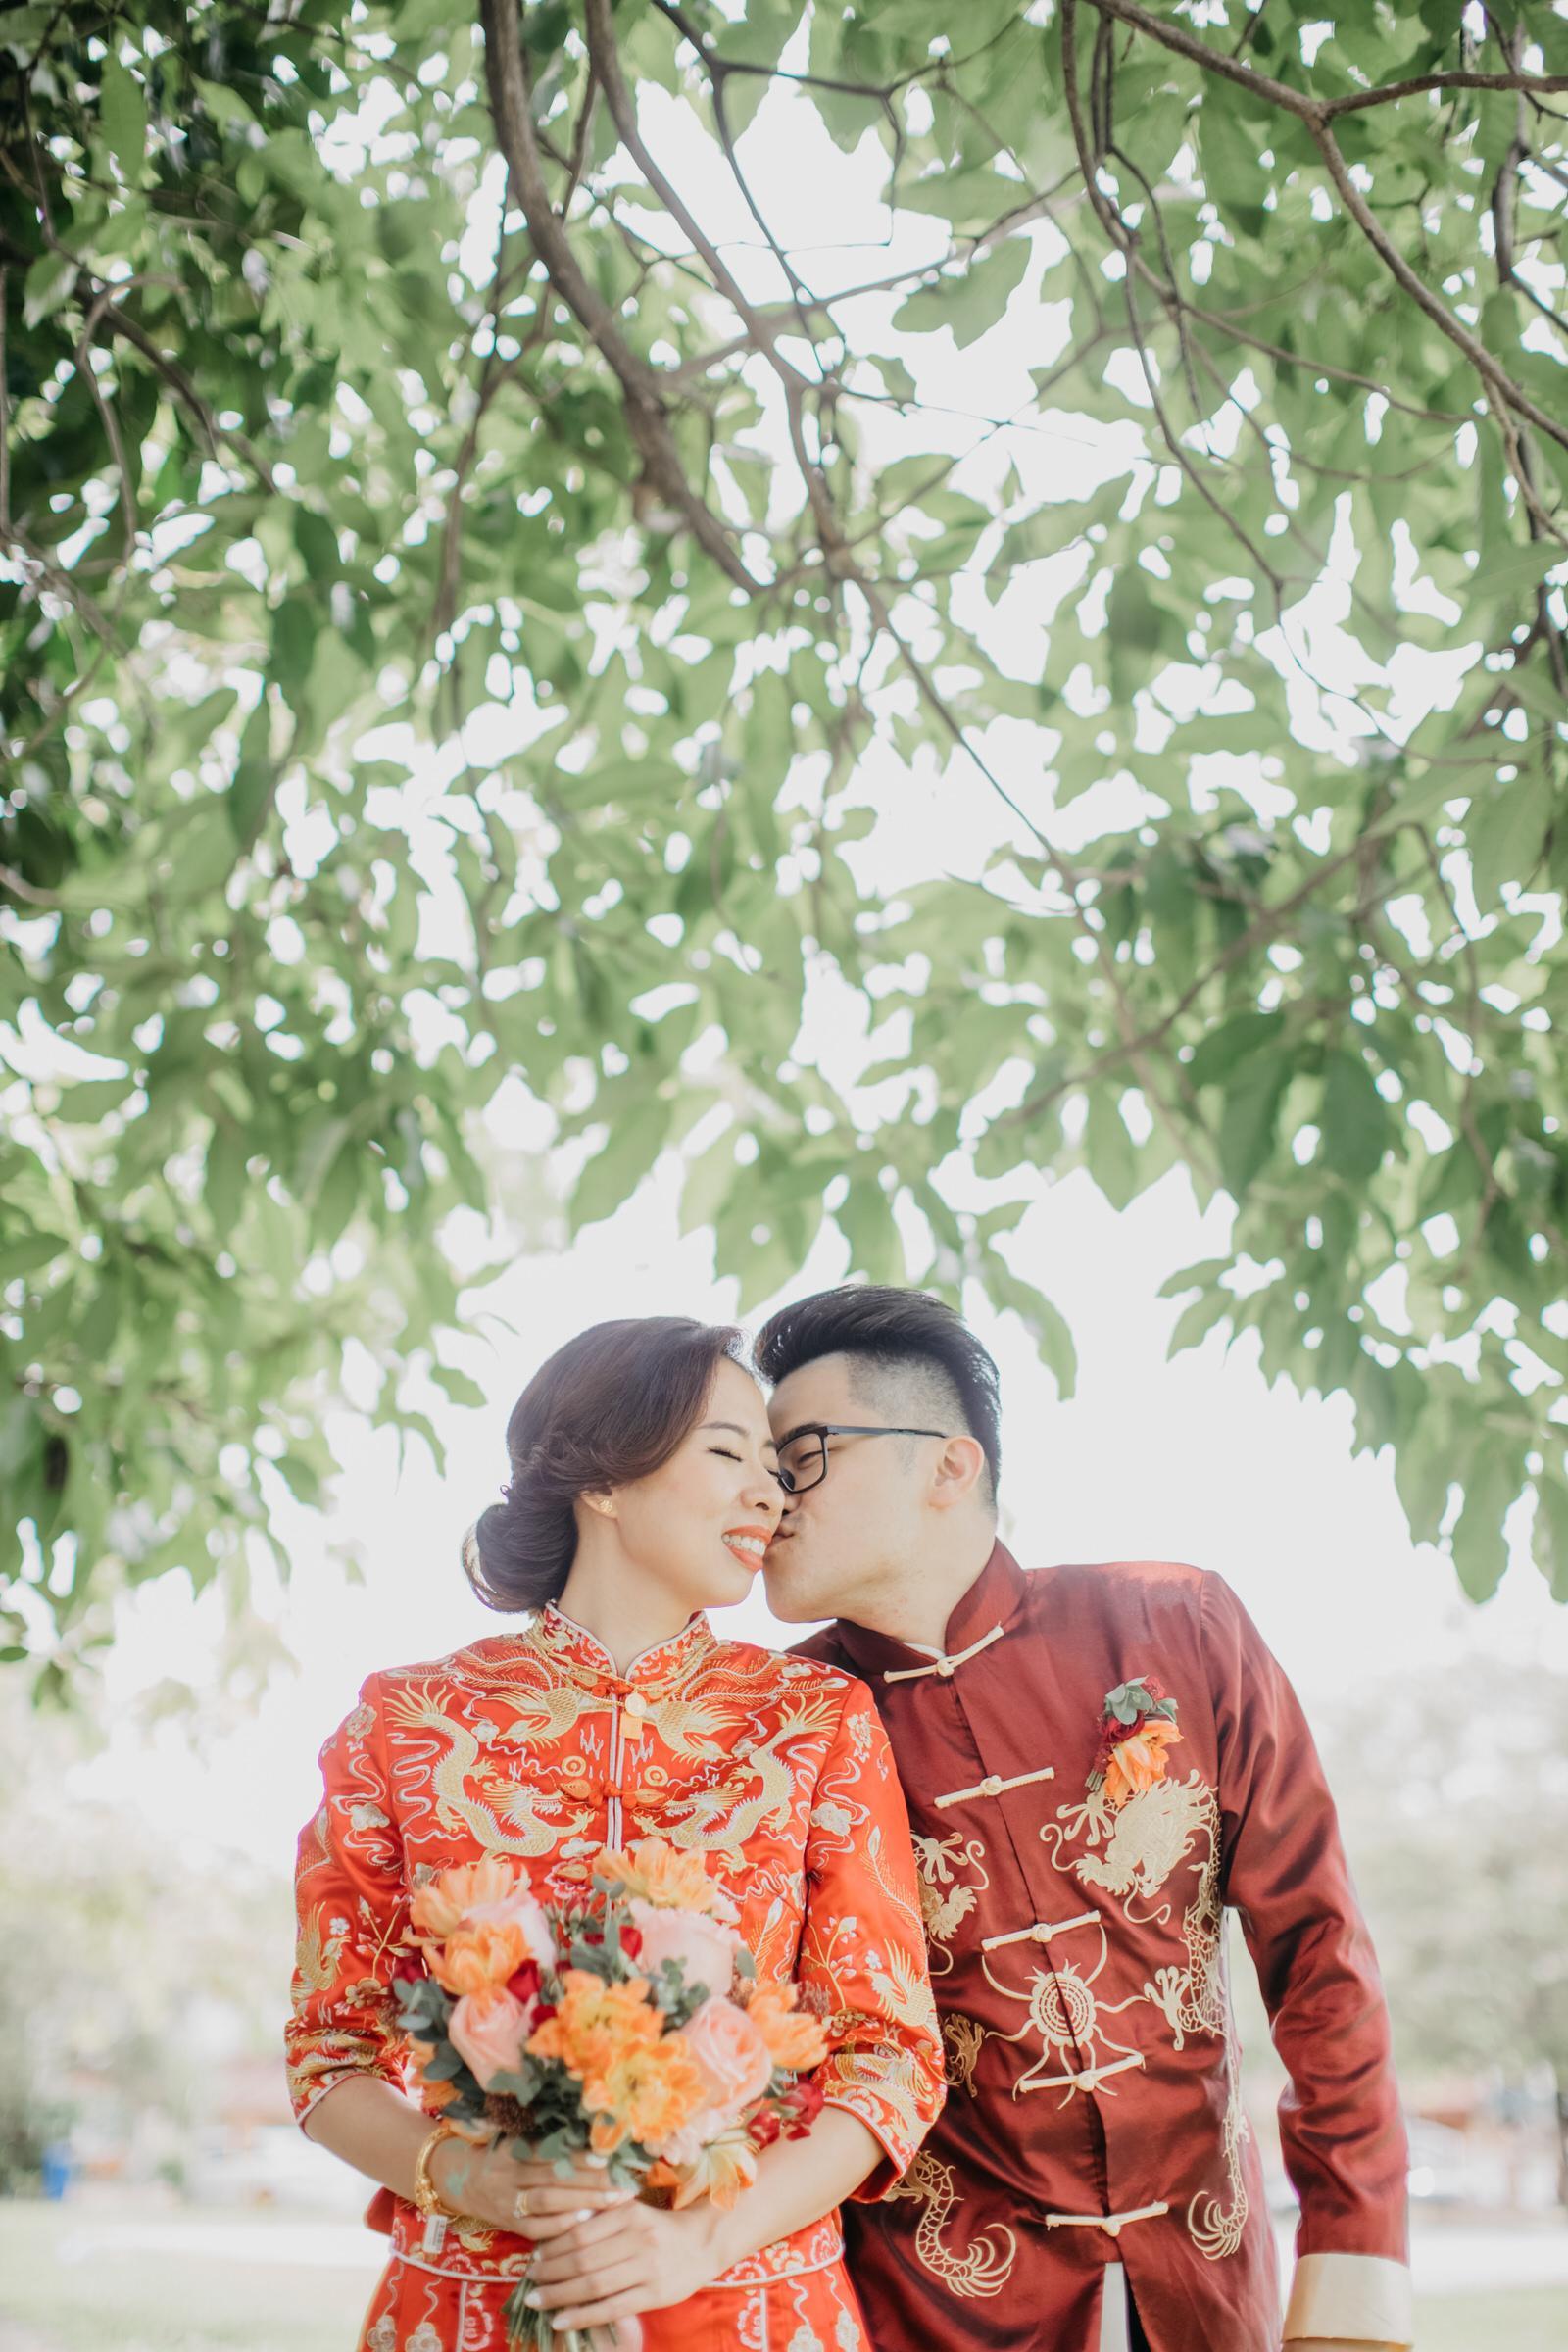 Chinese Traditional Wedding newlywed in Kwa in Kuala Lumpur Cliff Choong Photography